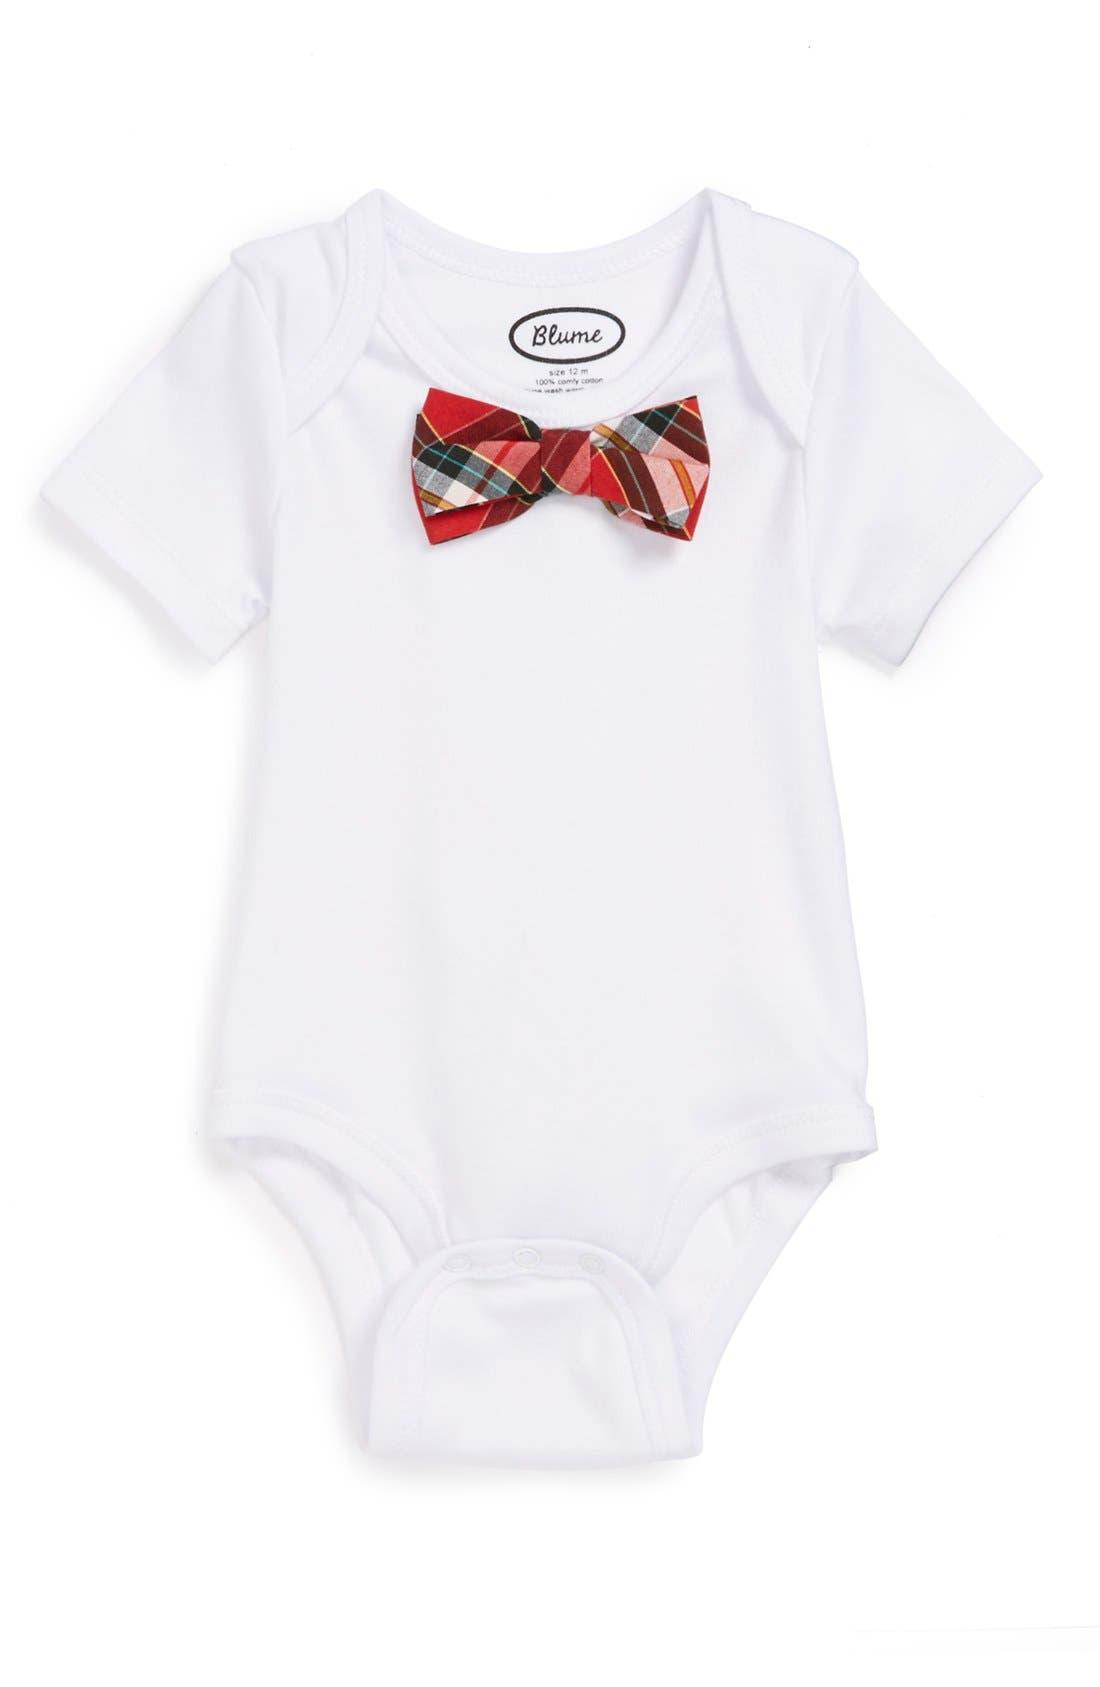 Alternate Image 1 Selected - Blume 'Bow Tie' Bodysuit (Baby Boys)